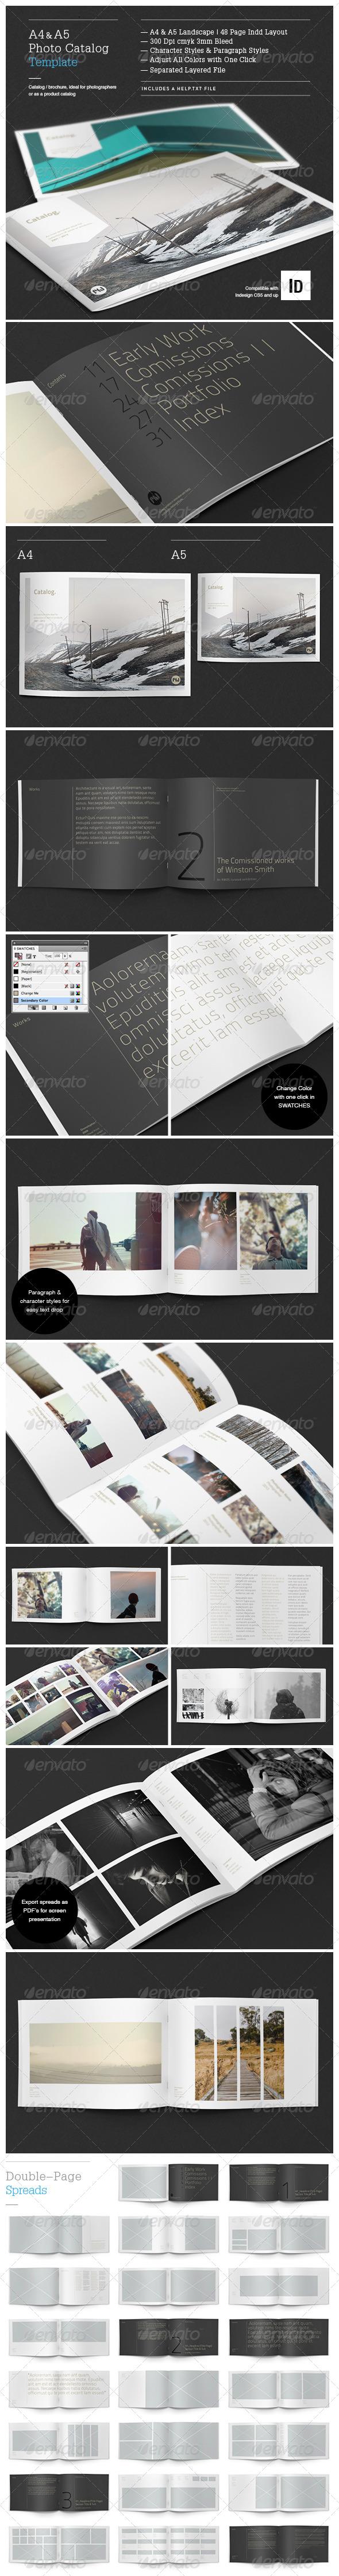 Minimal Photo Catalog Template - Brochures Print Templates